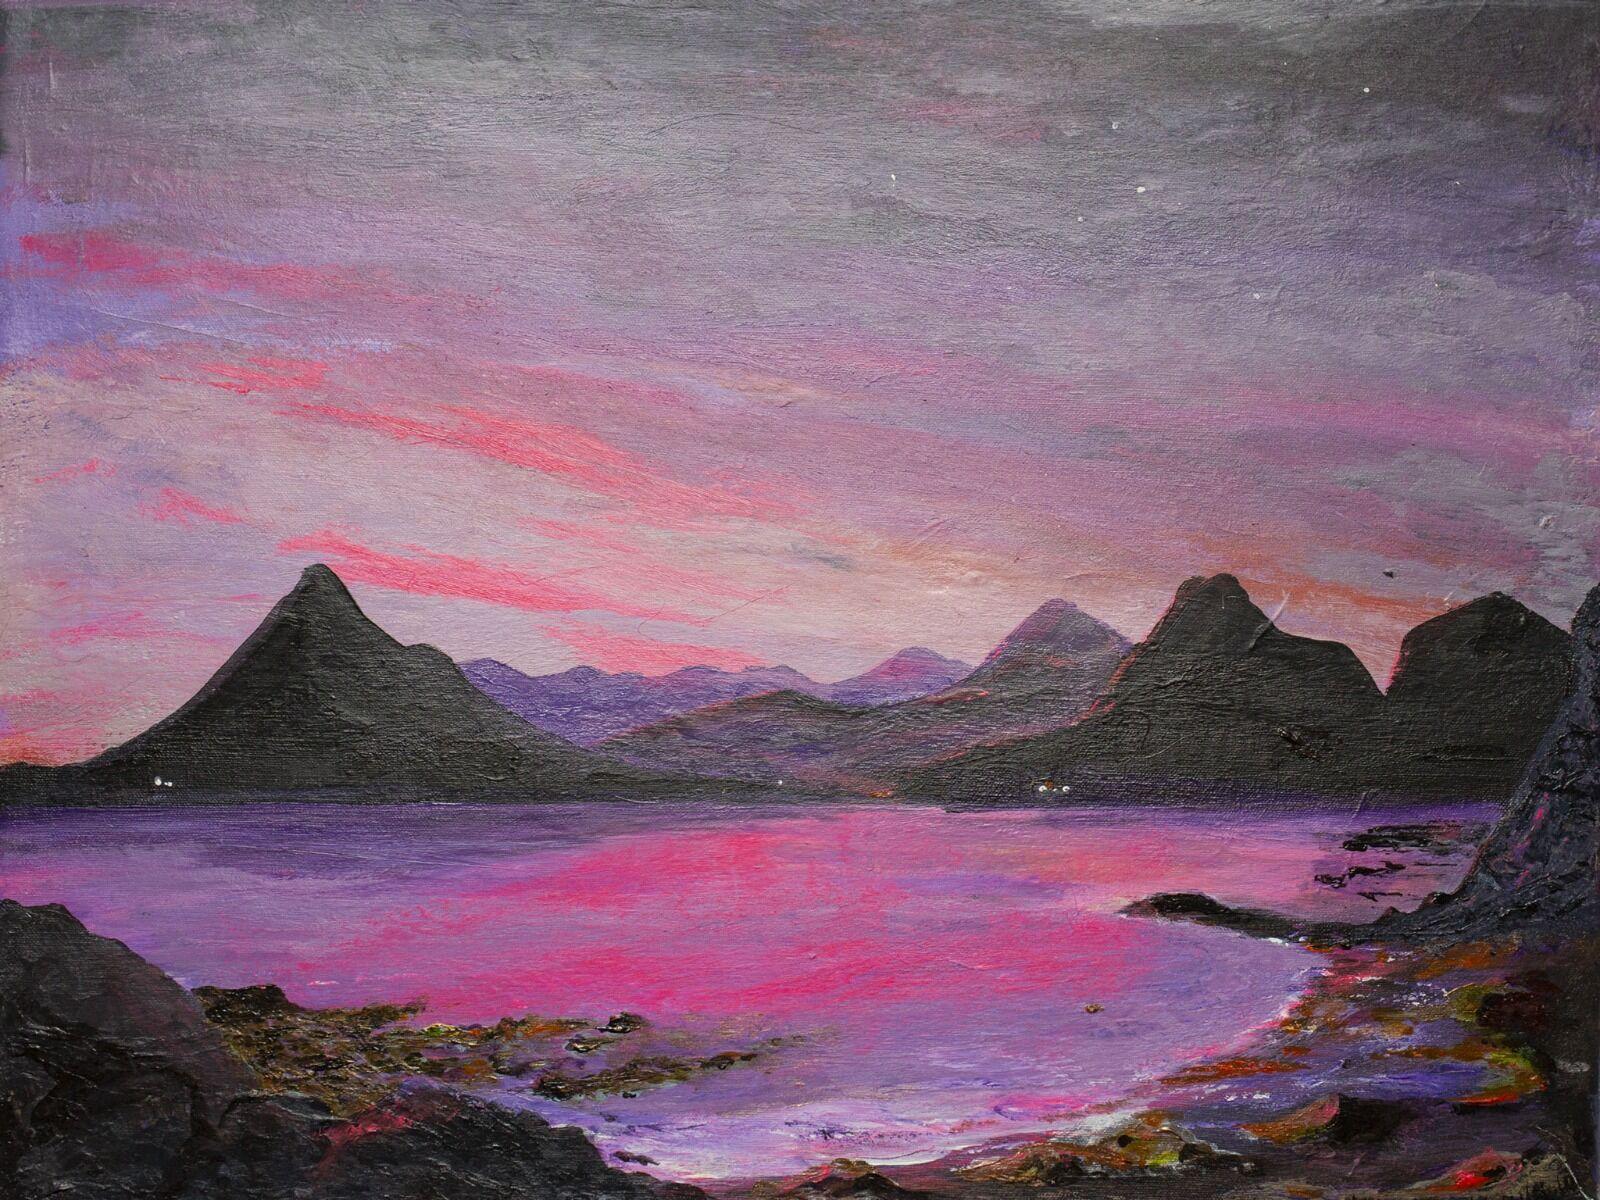 Purple Mountains - Skye Scotland